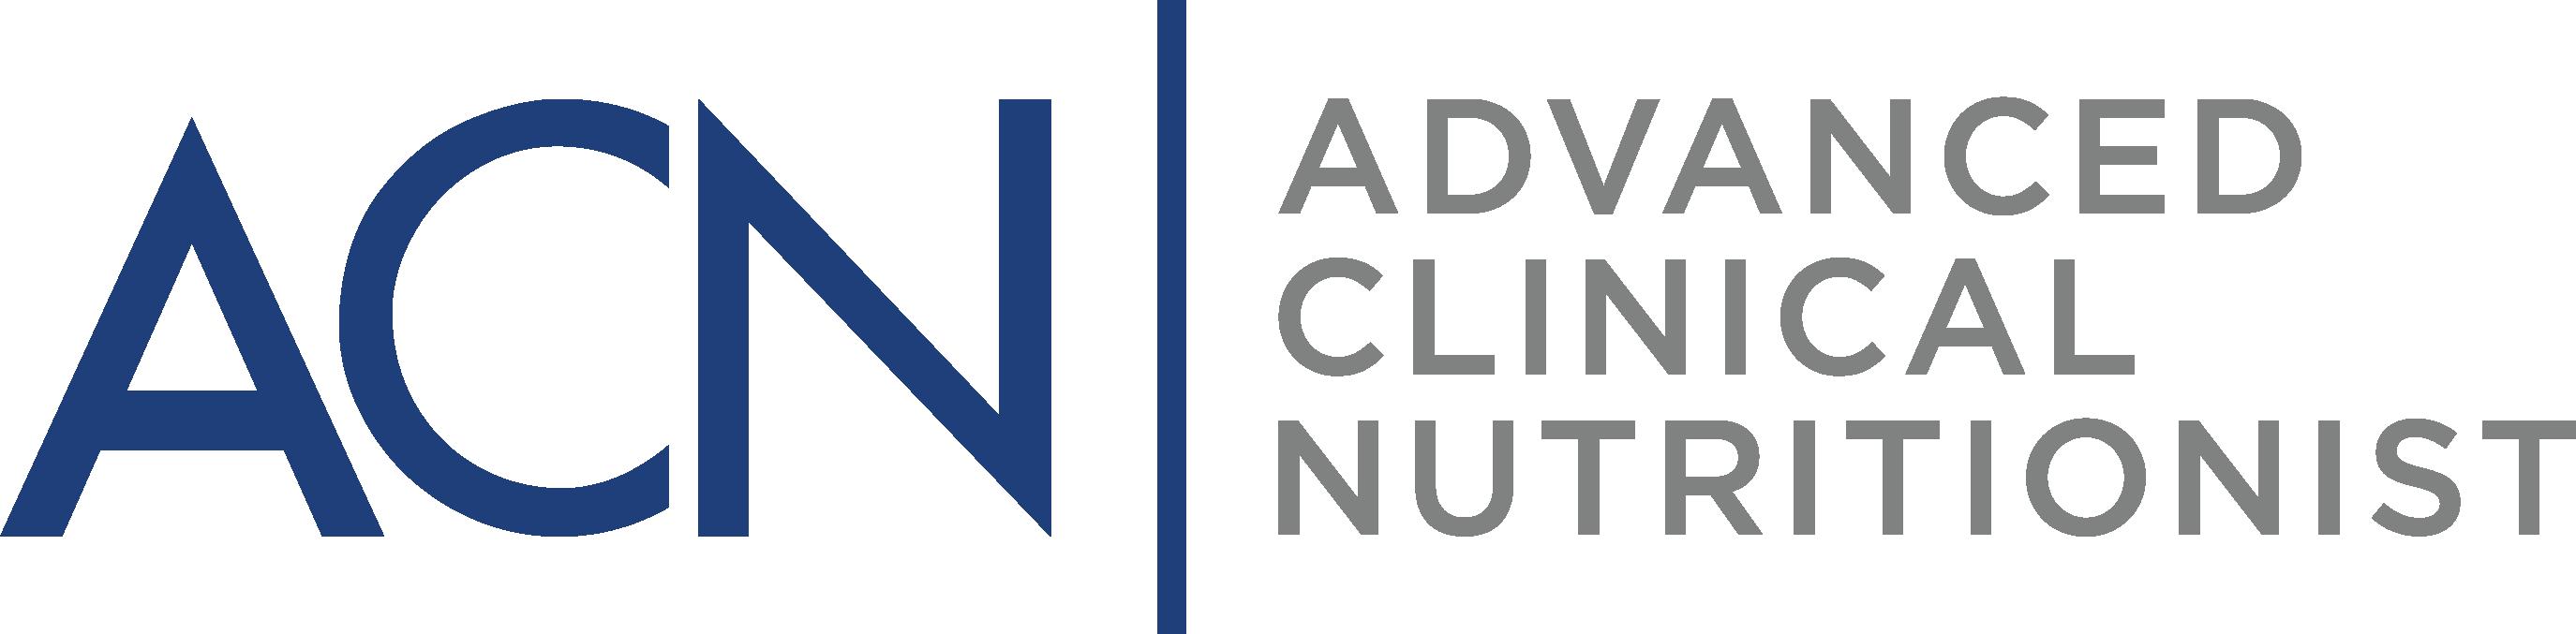 ACN Advanced Clinical Nutritionist